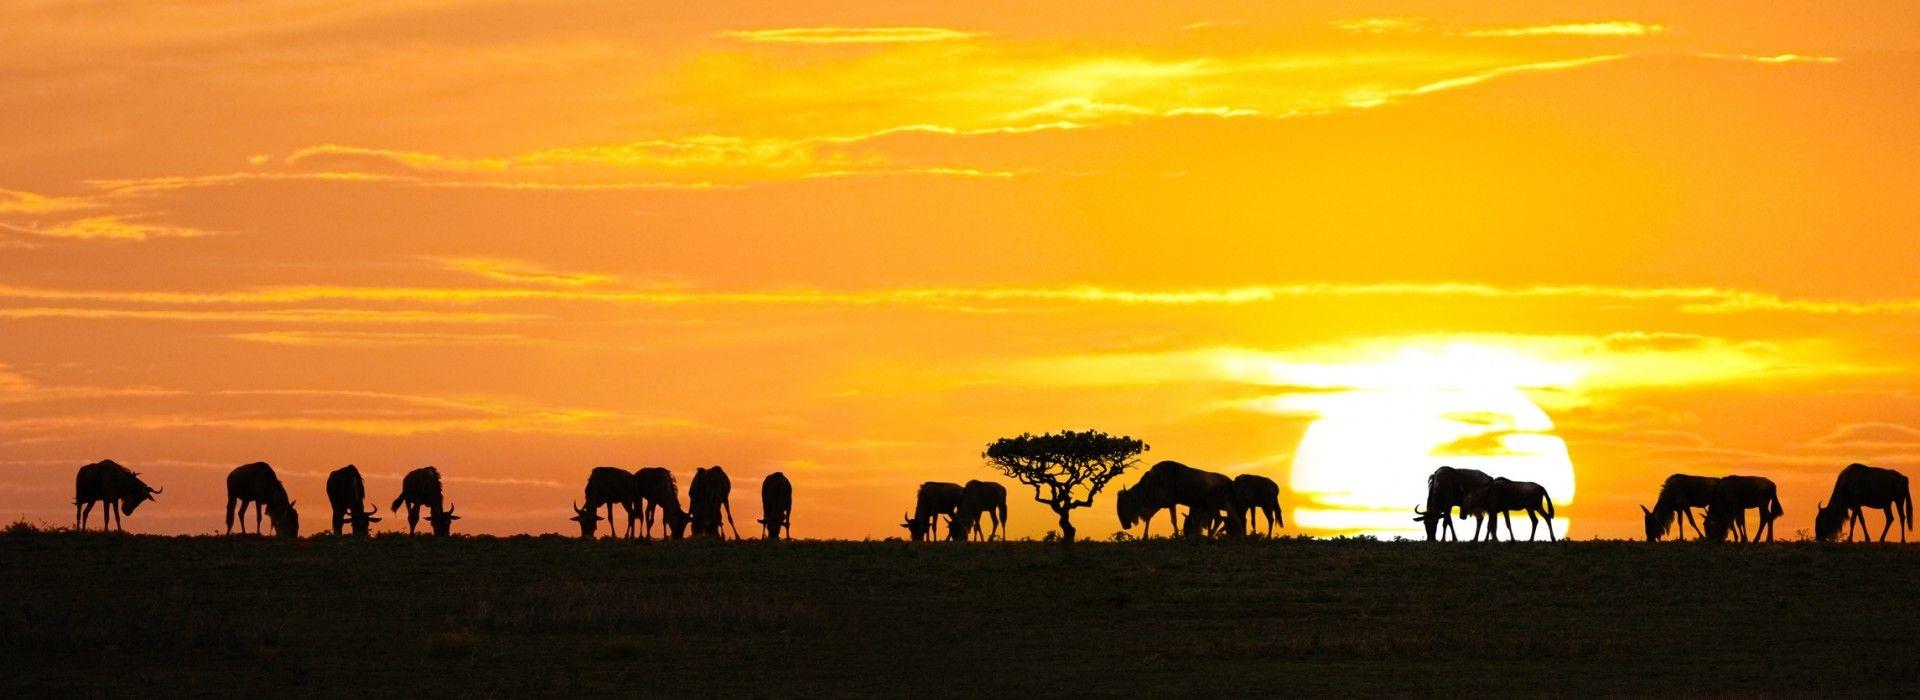 Camping Tours in Tanzania